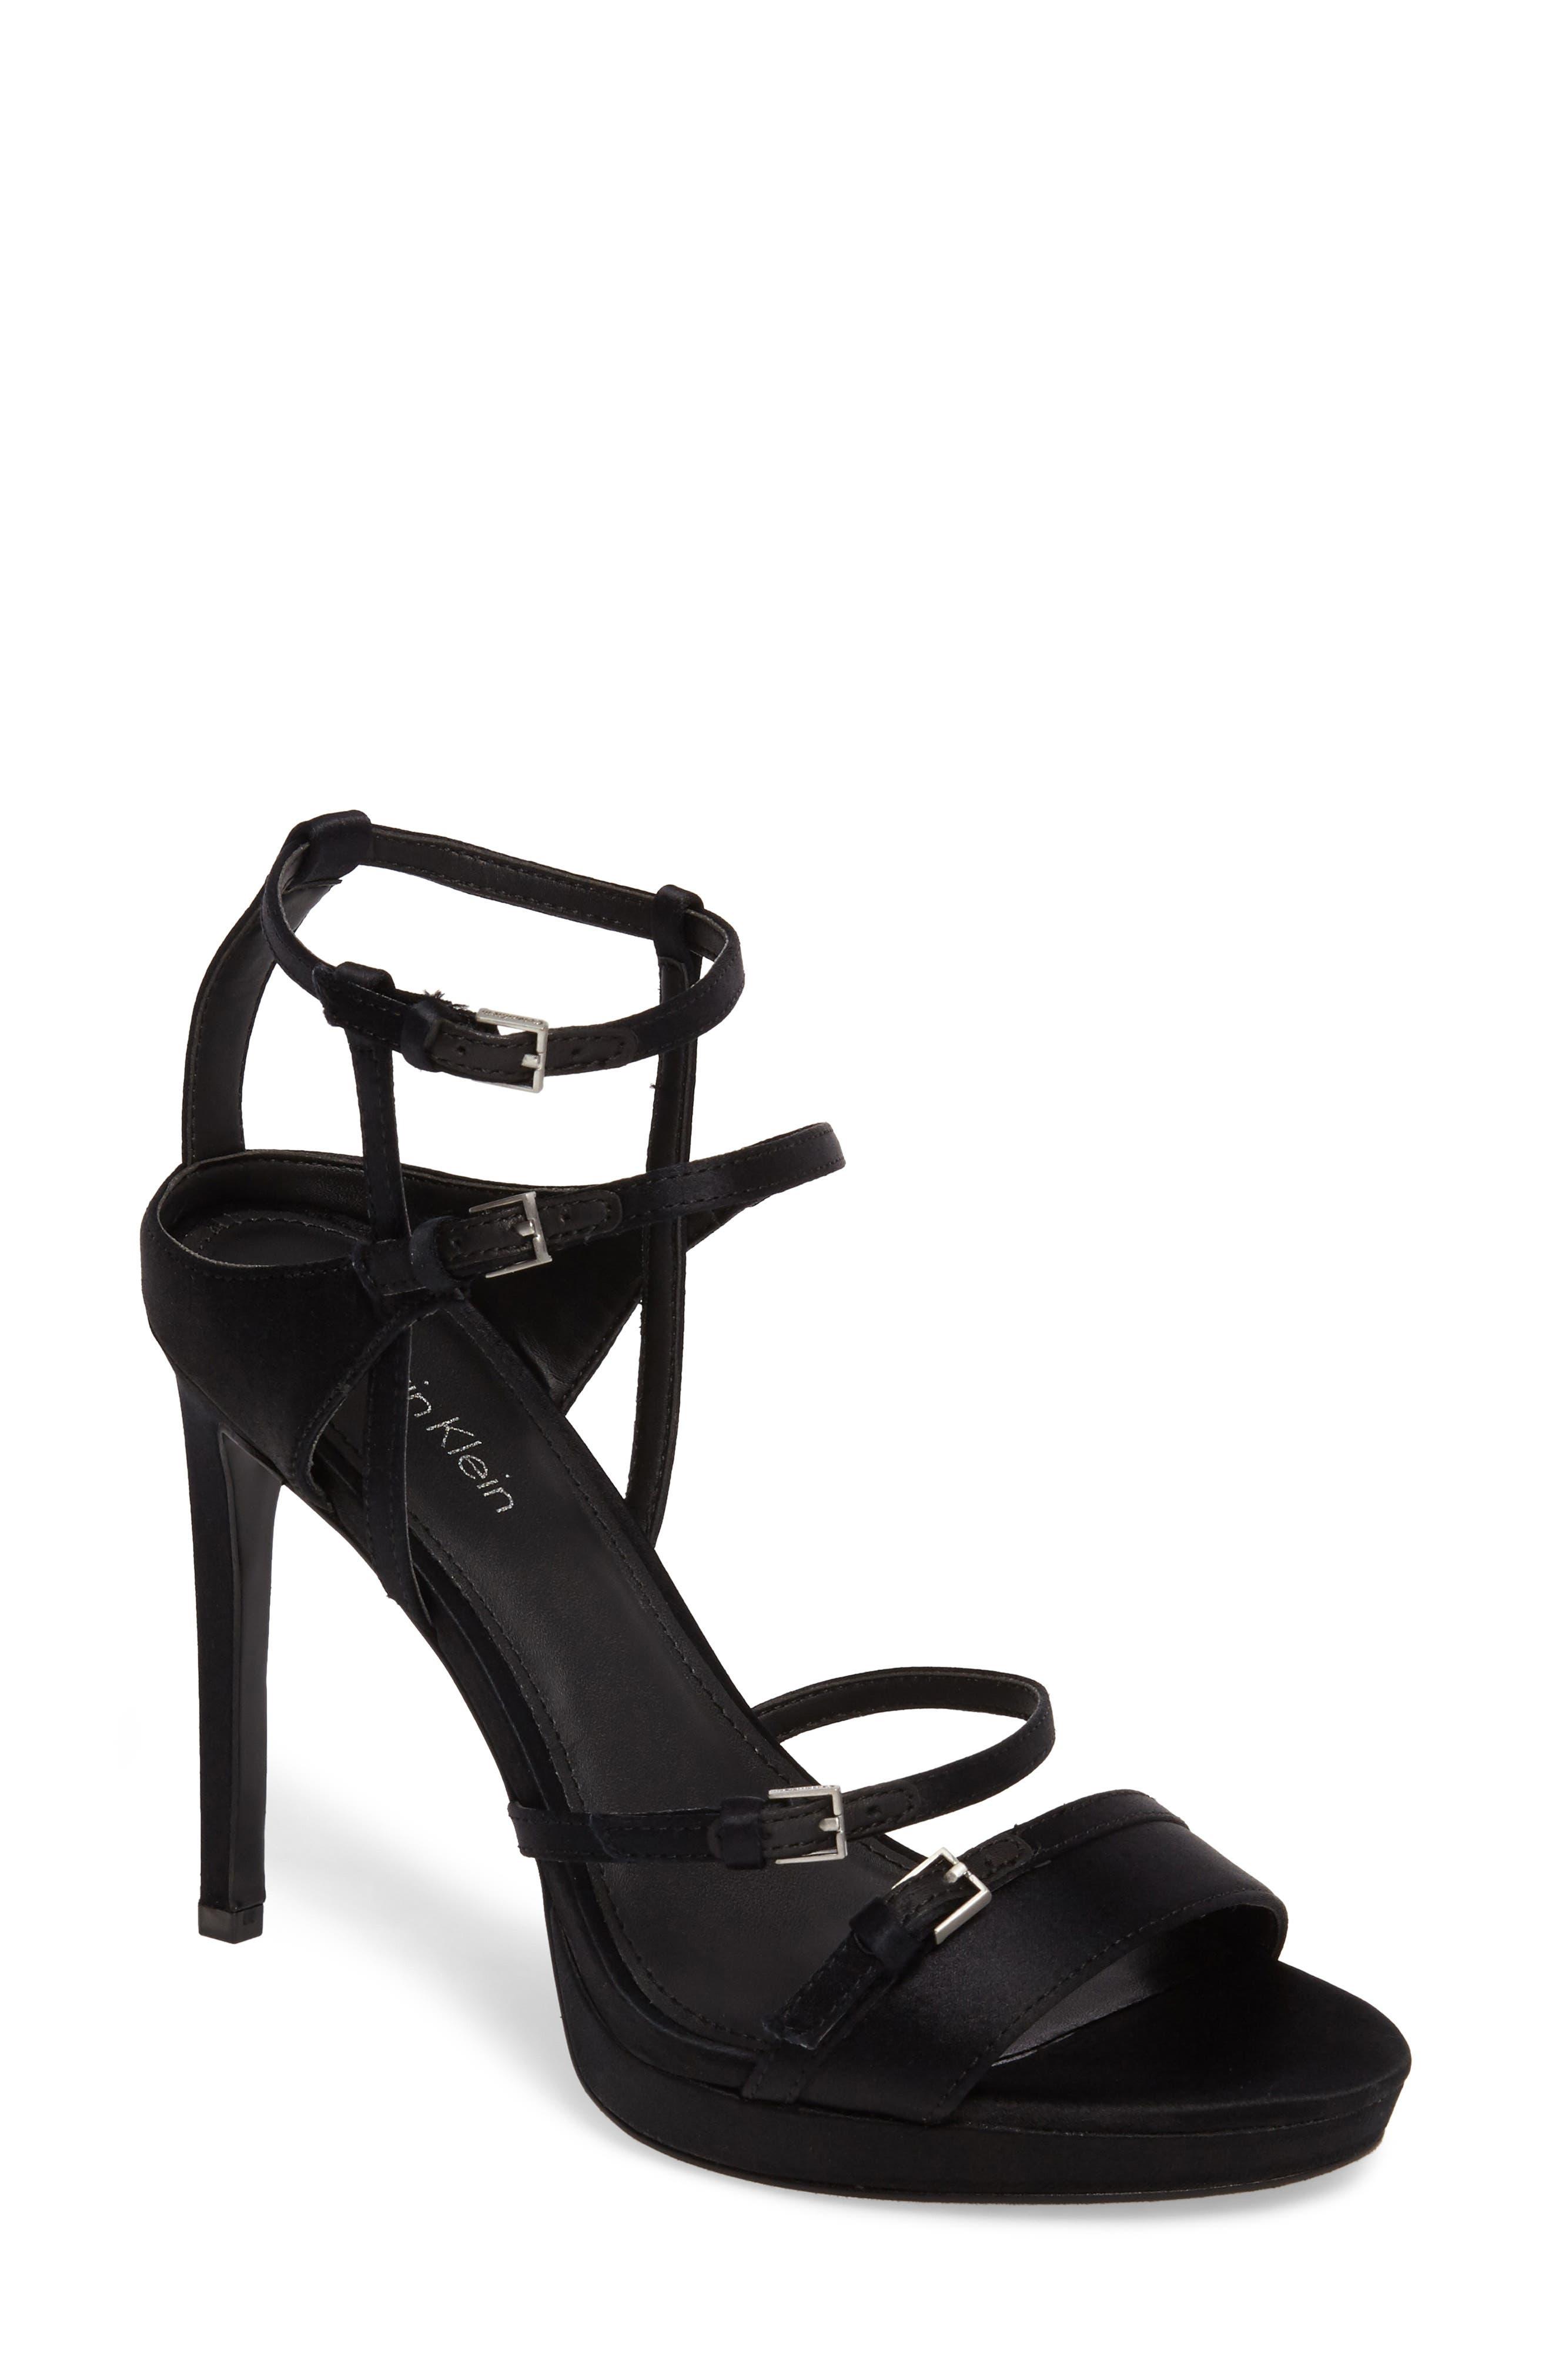 Main Image - Calvin Klein Shantell Strappy Platform Sandal (Women)